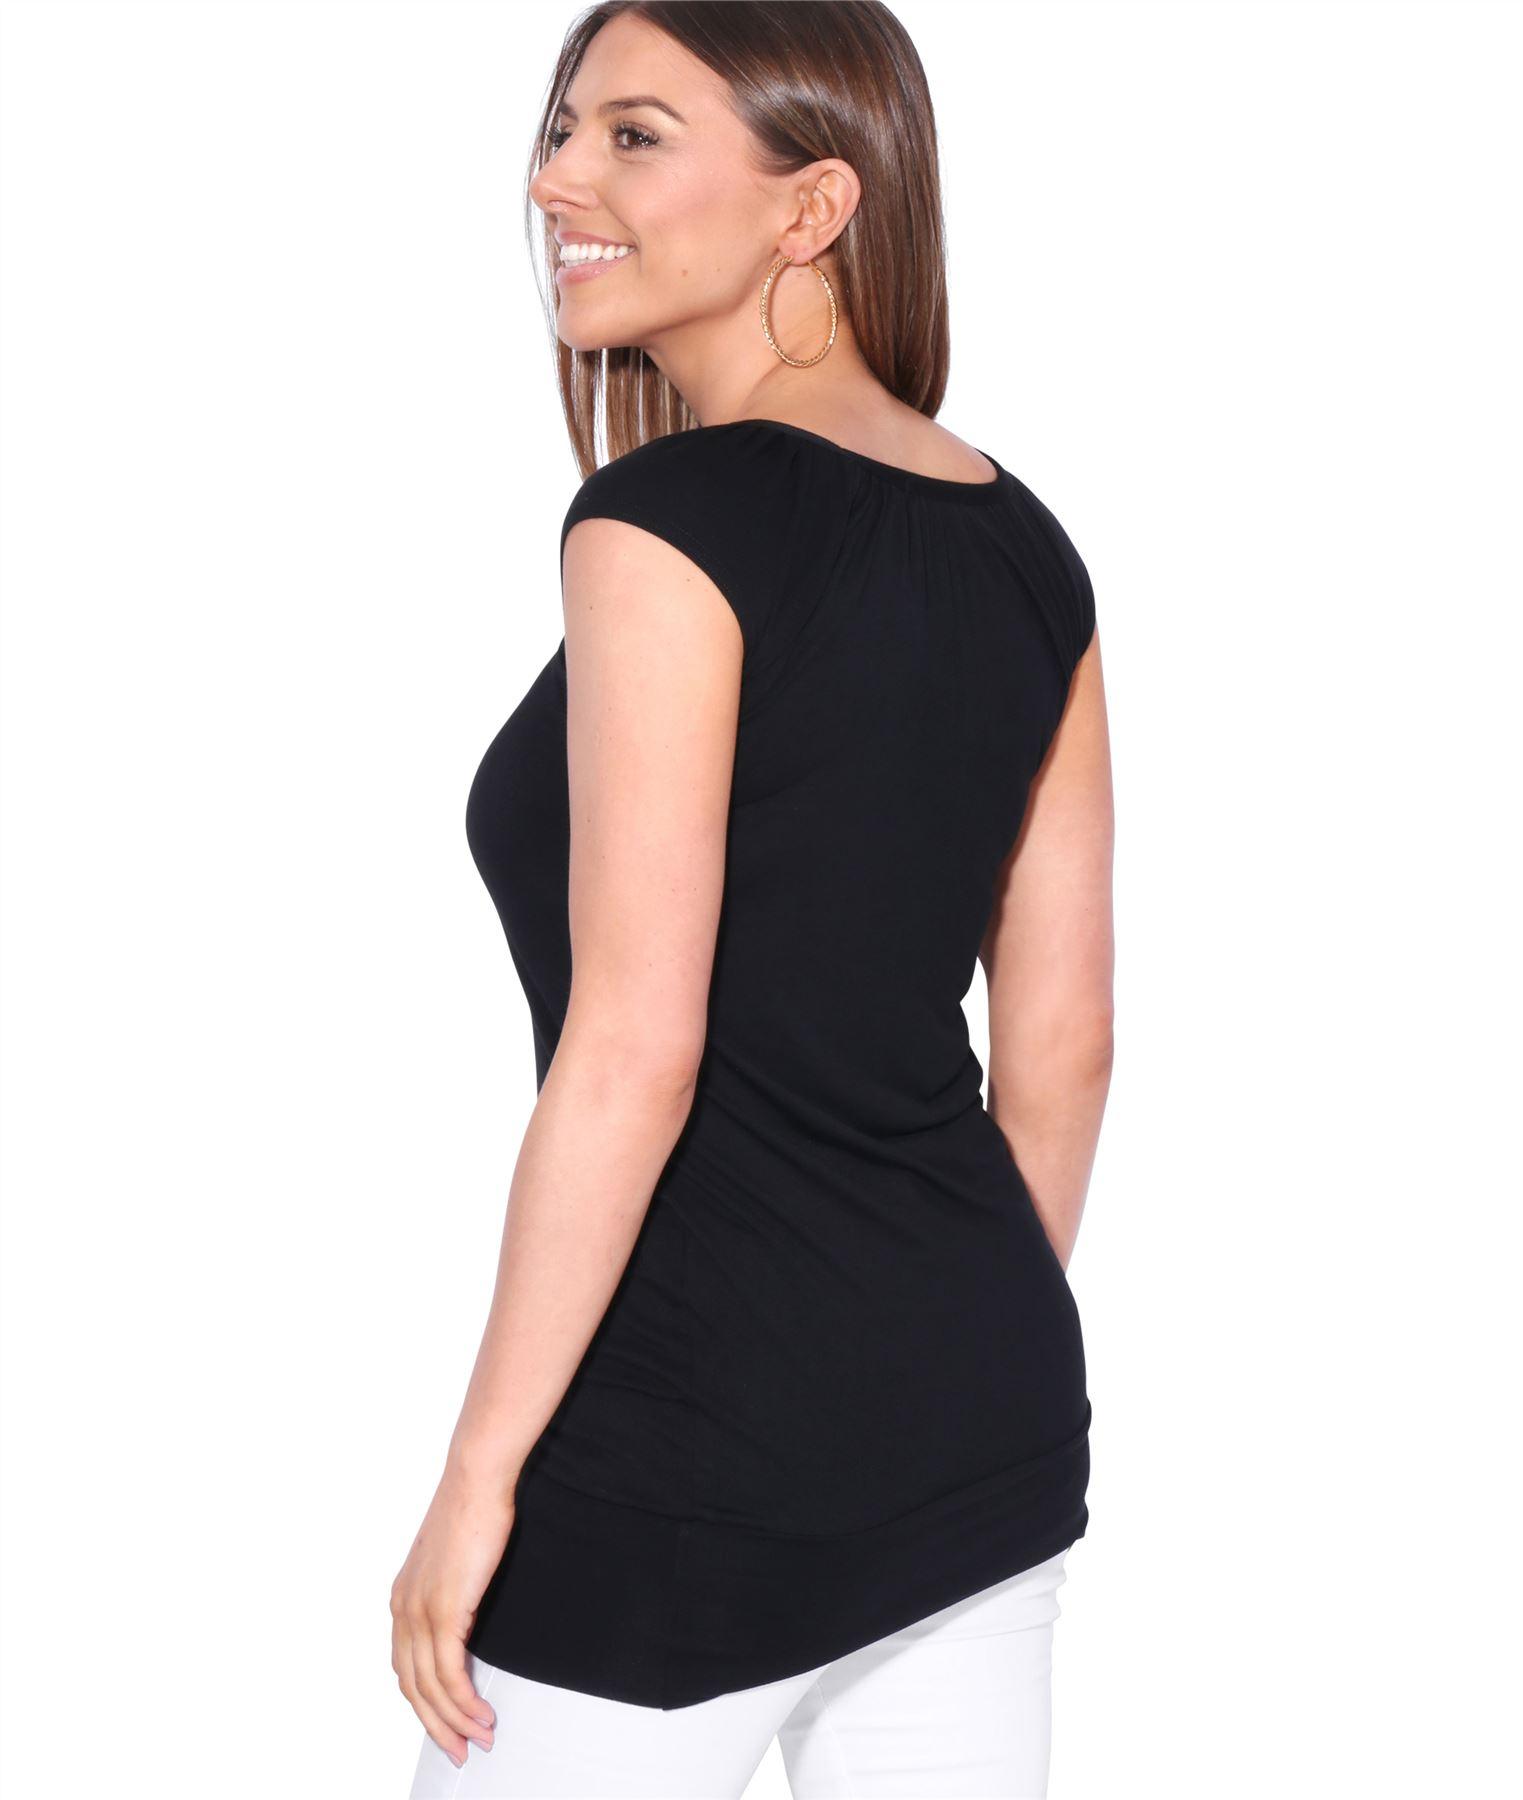 Womens-Ladies-Plain-T-Shirt-Short-Sleeve-Long-Loose-V-Neck-Blouse-Tunic-Top thumbnail 7